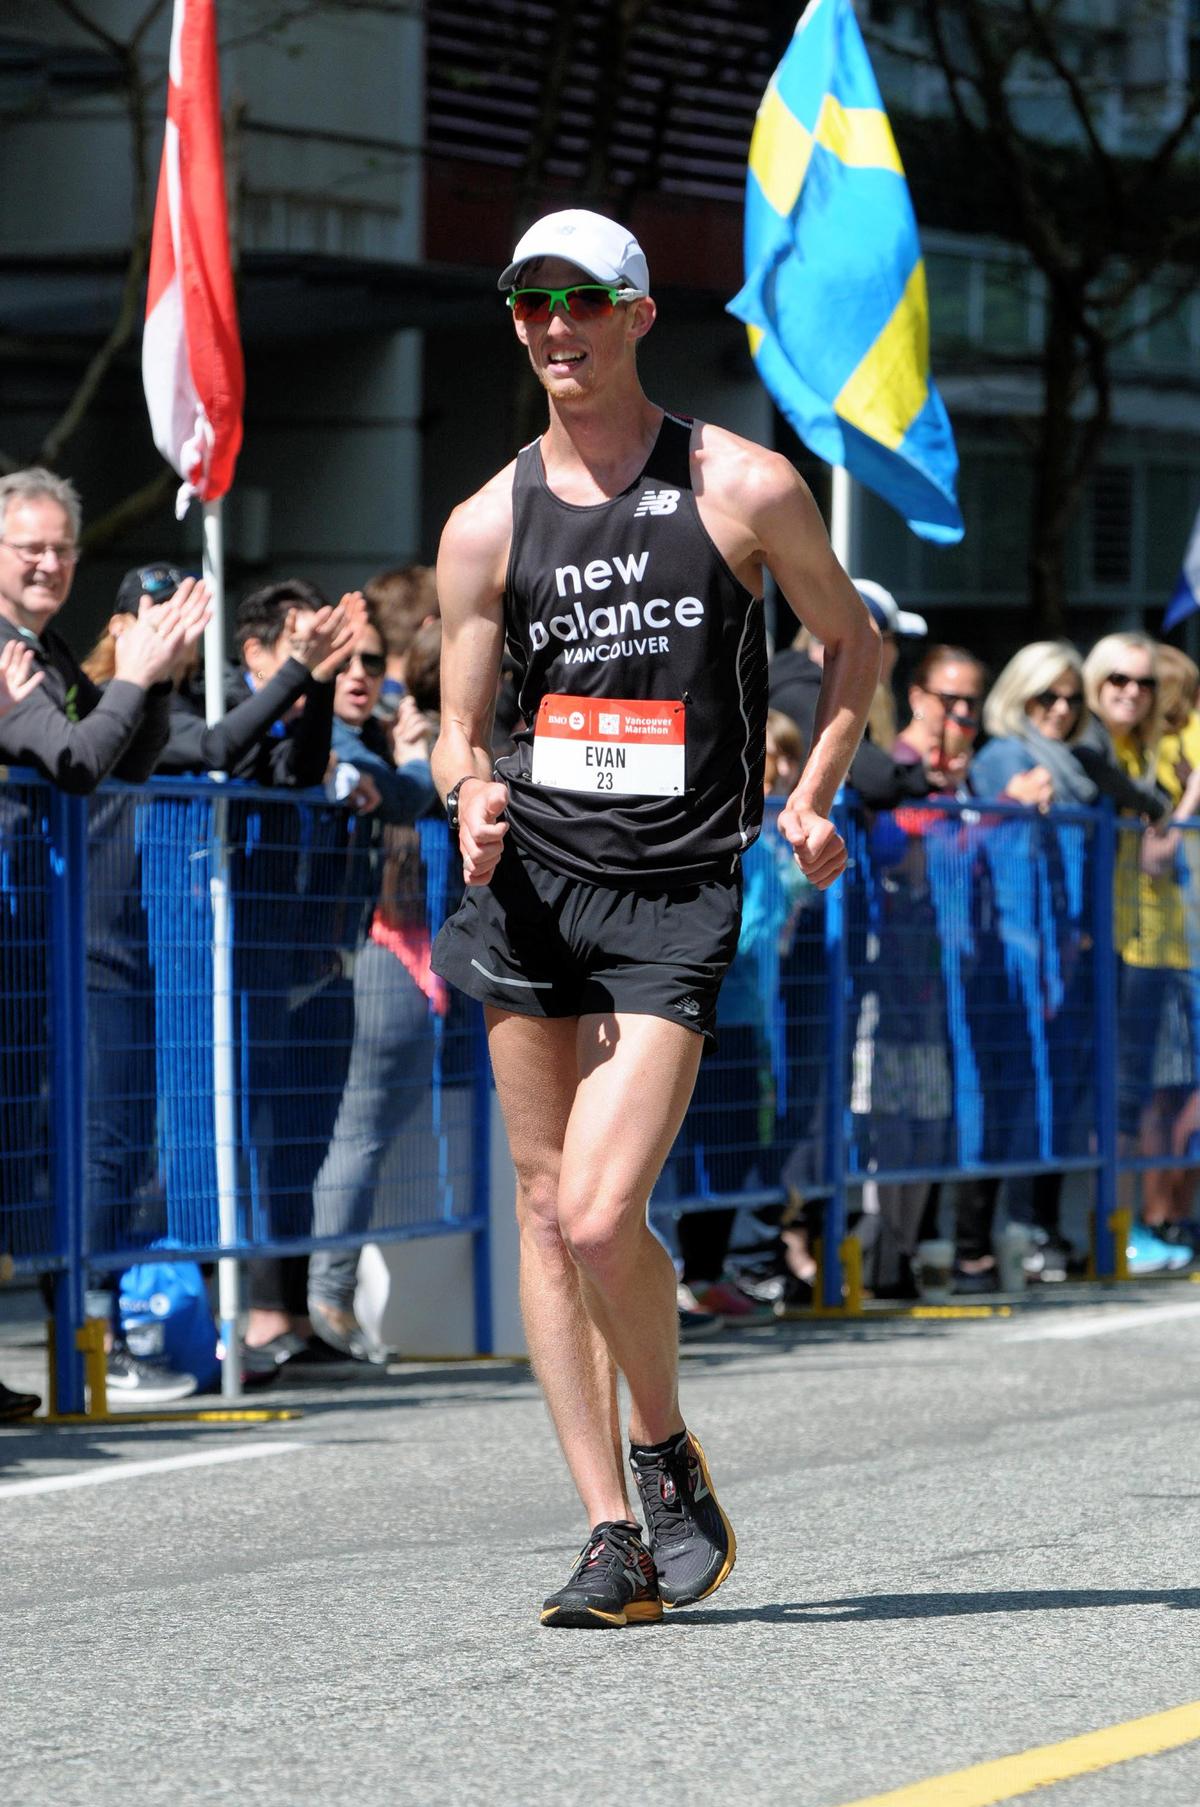 49-2017-EvanDunfee-OlympianRaceWalker-onlookers-VancouverMarathon-MarathonFoto-RUNVAN-web